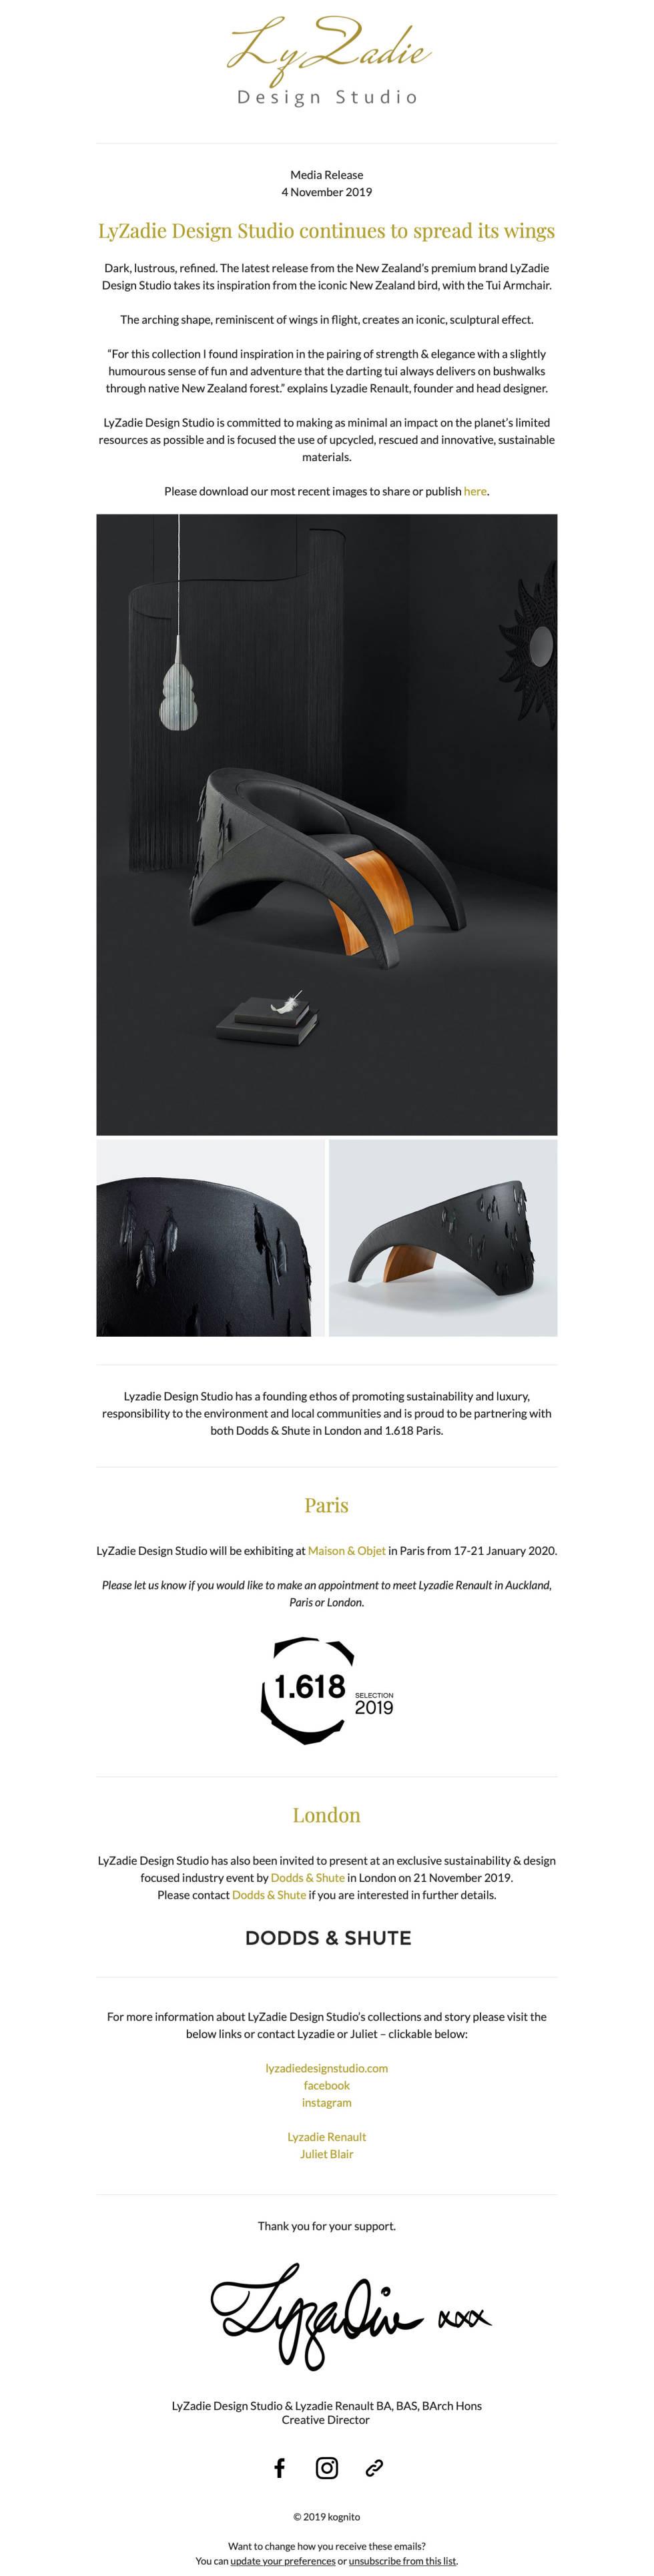 Image of Lyzadie design studio media release